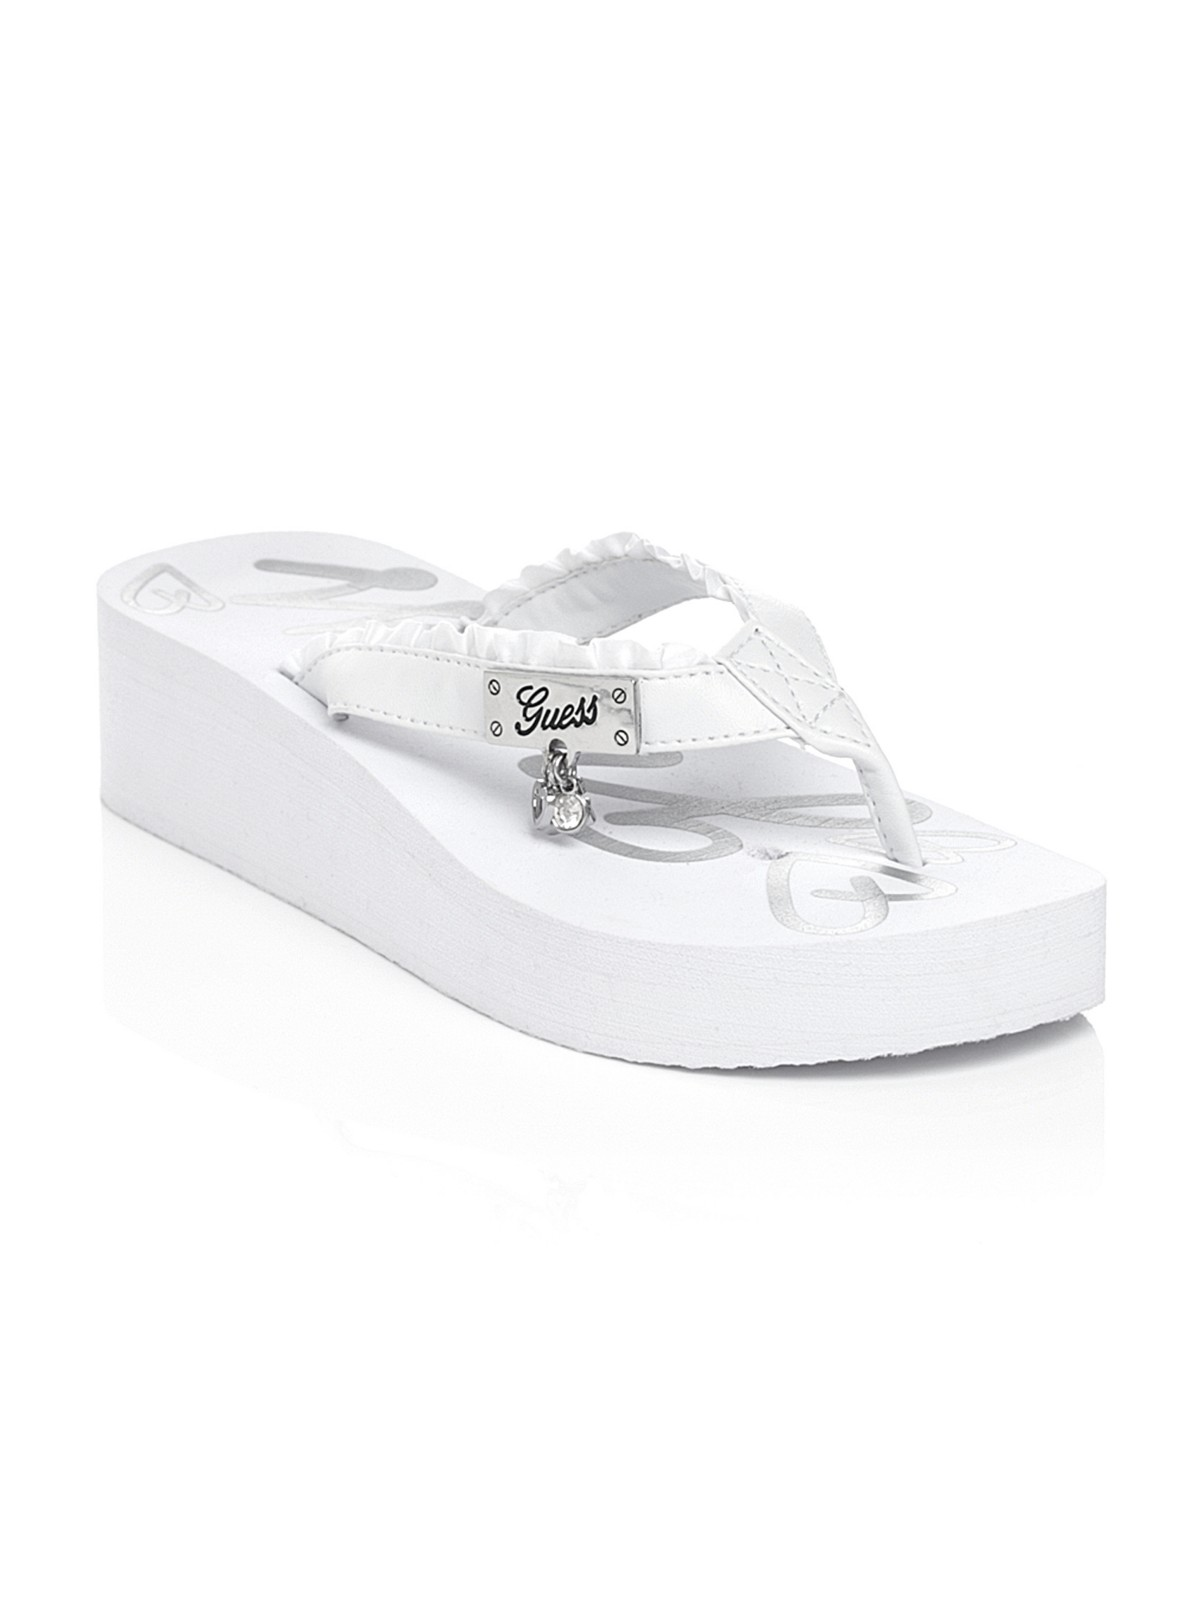 GUESS-Madalyn-Flip-Flop-Sandals